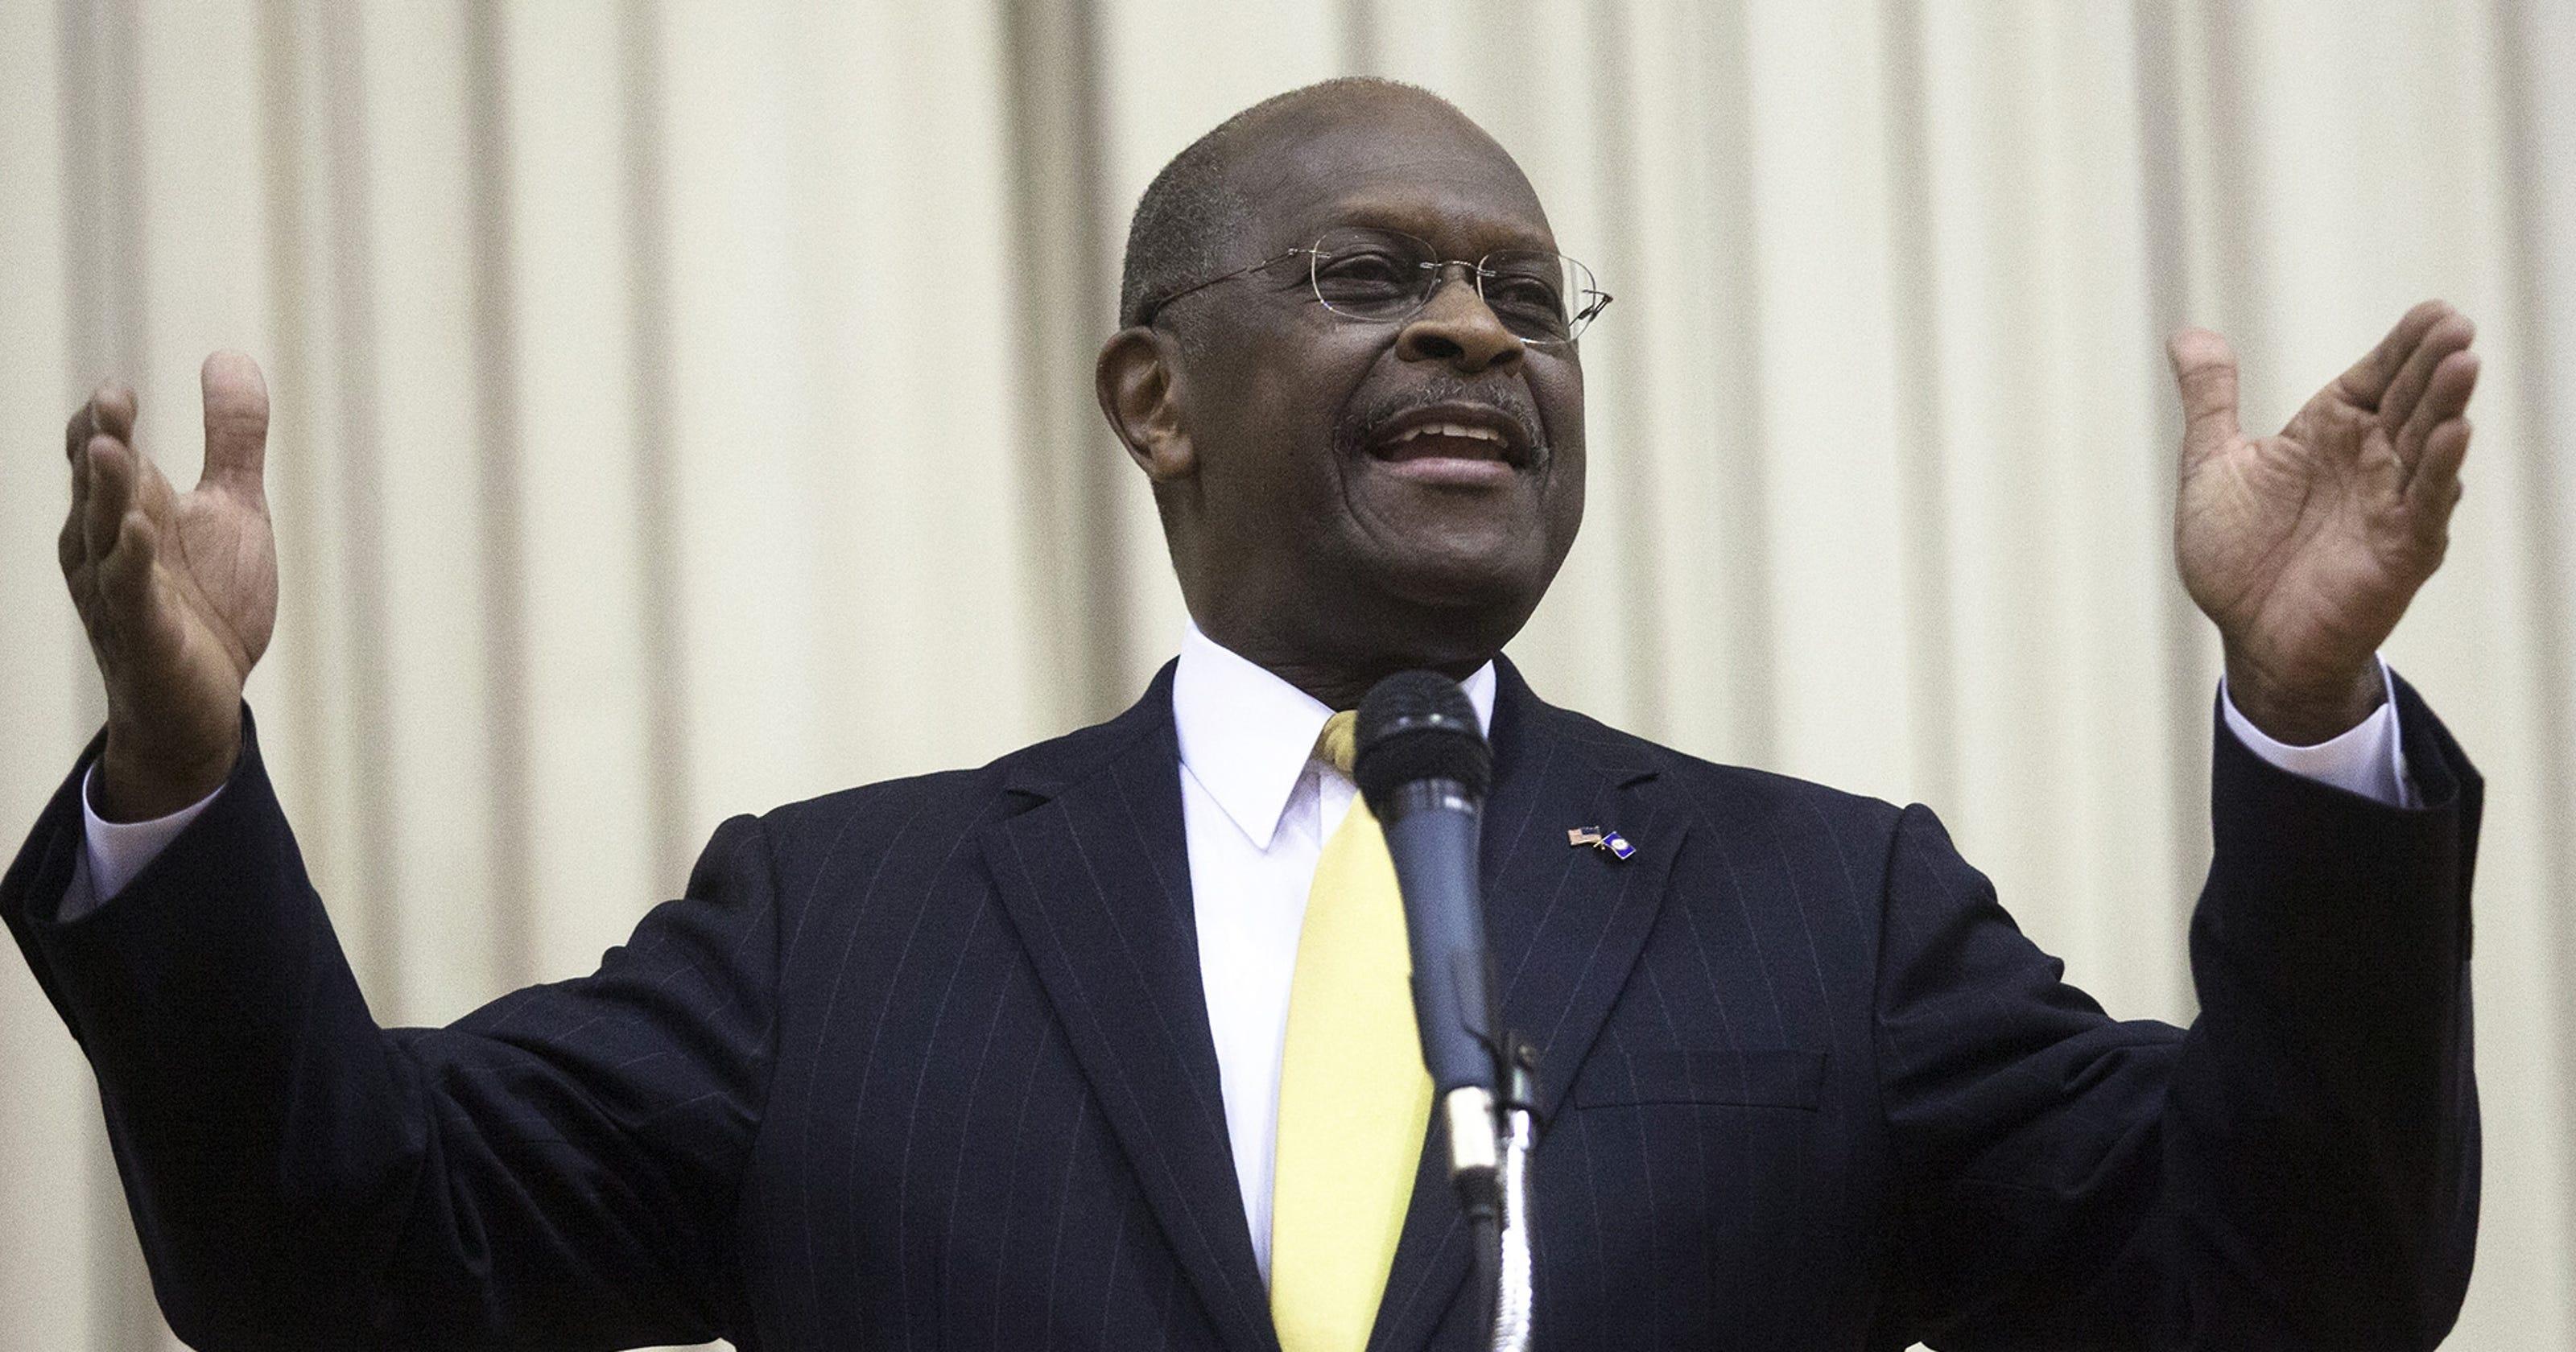 Saberpoint: Herman Cain Wins First Republican Debate in ...  |Herman Cain